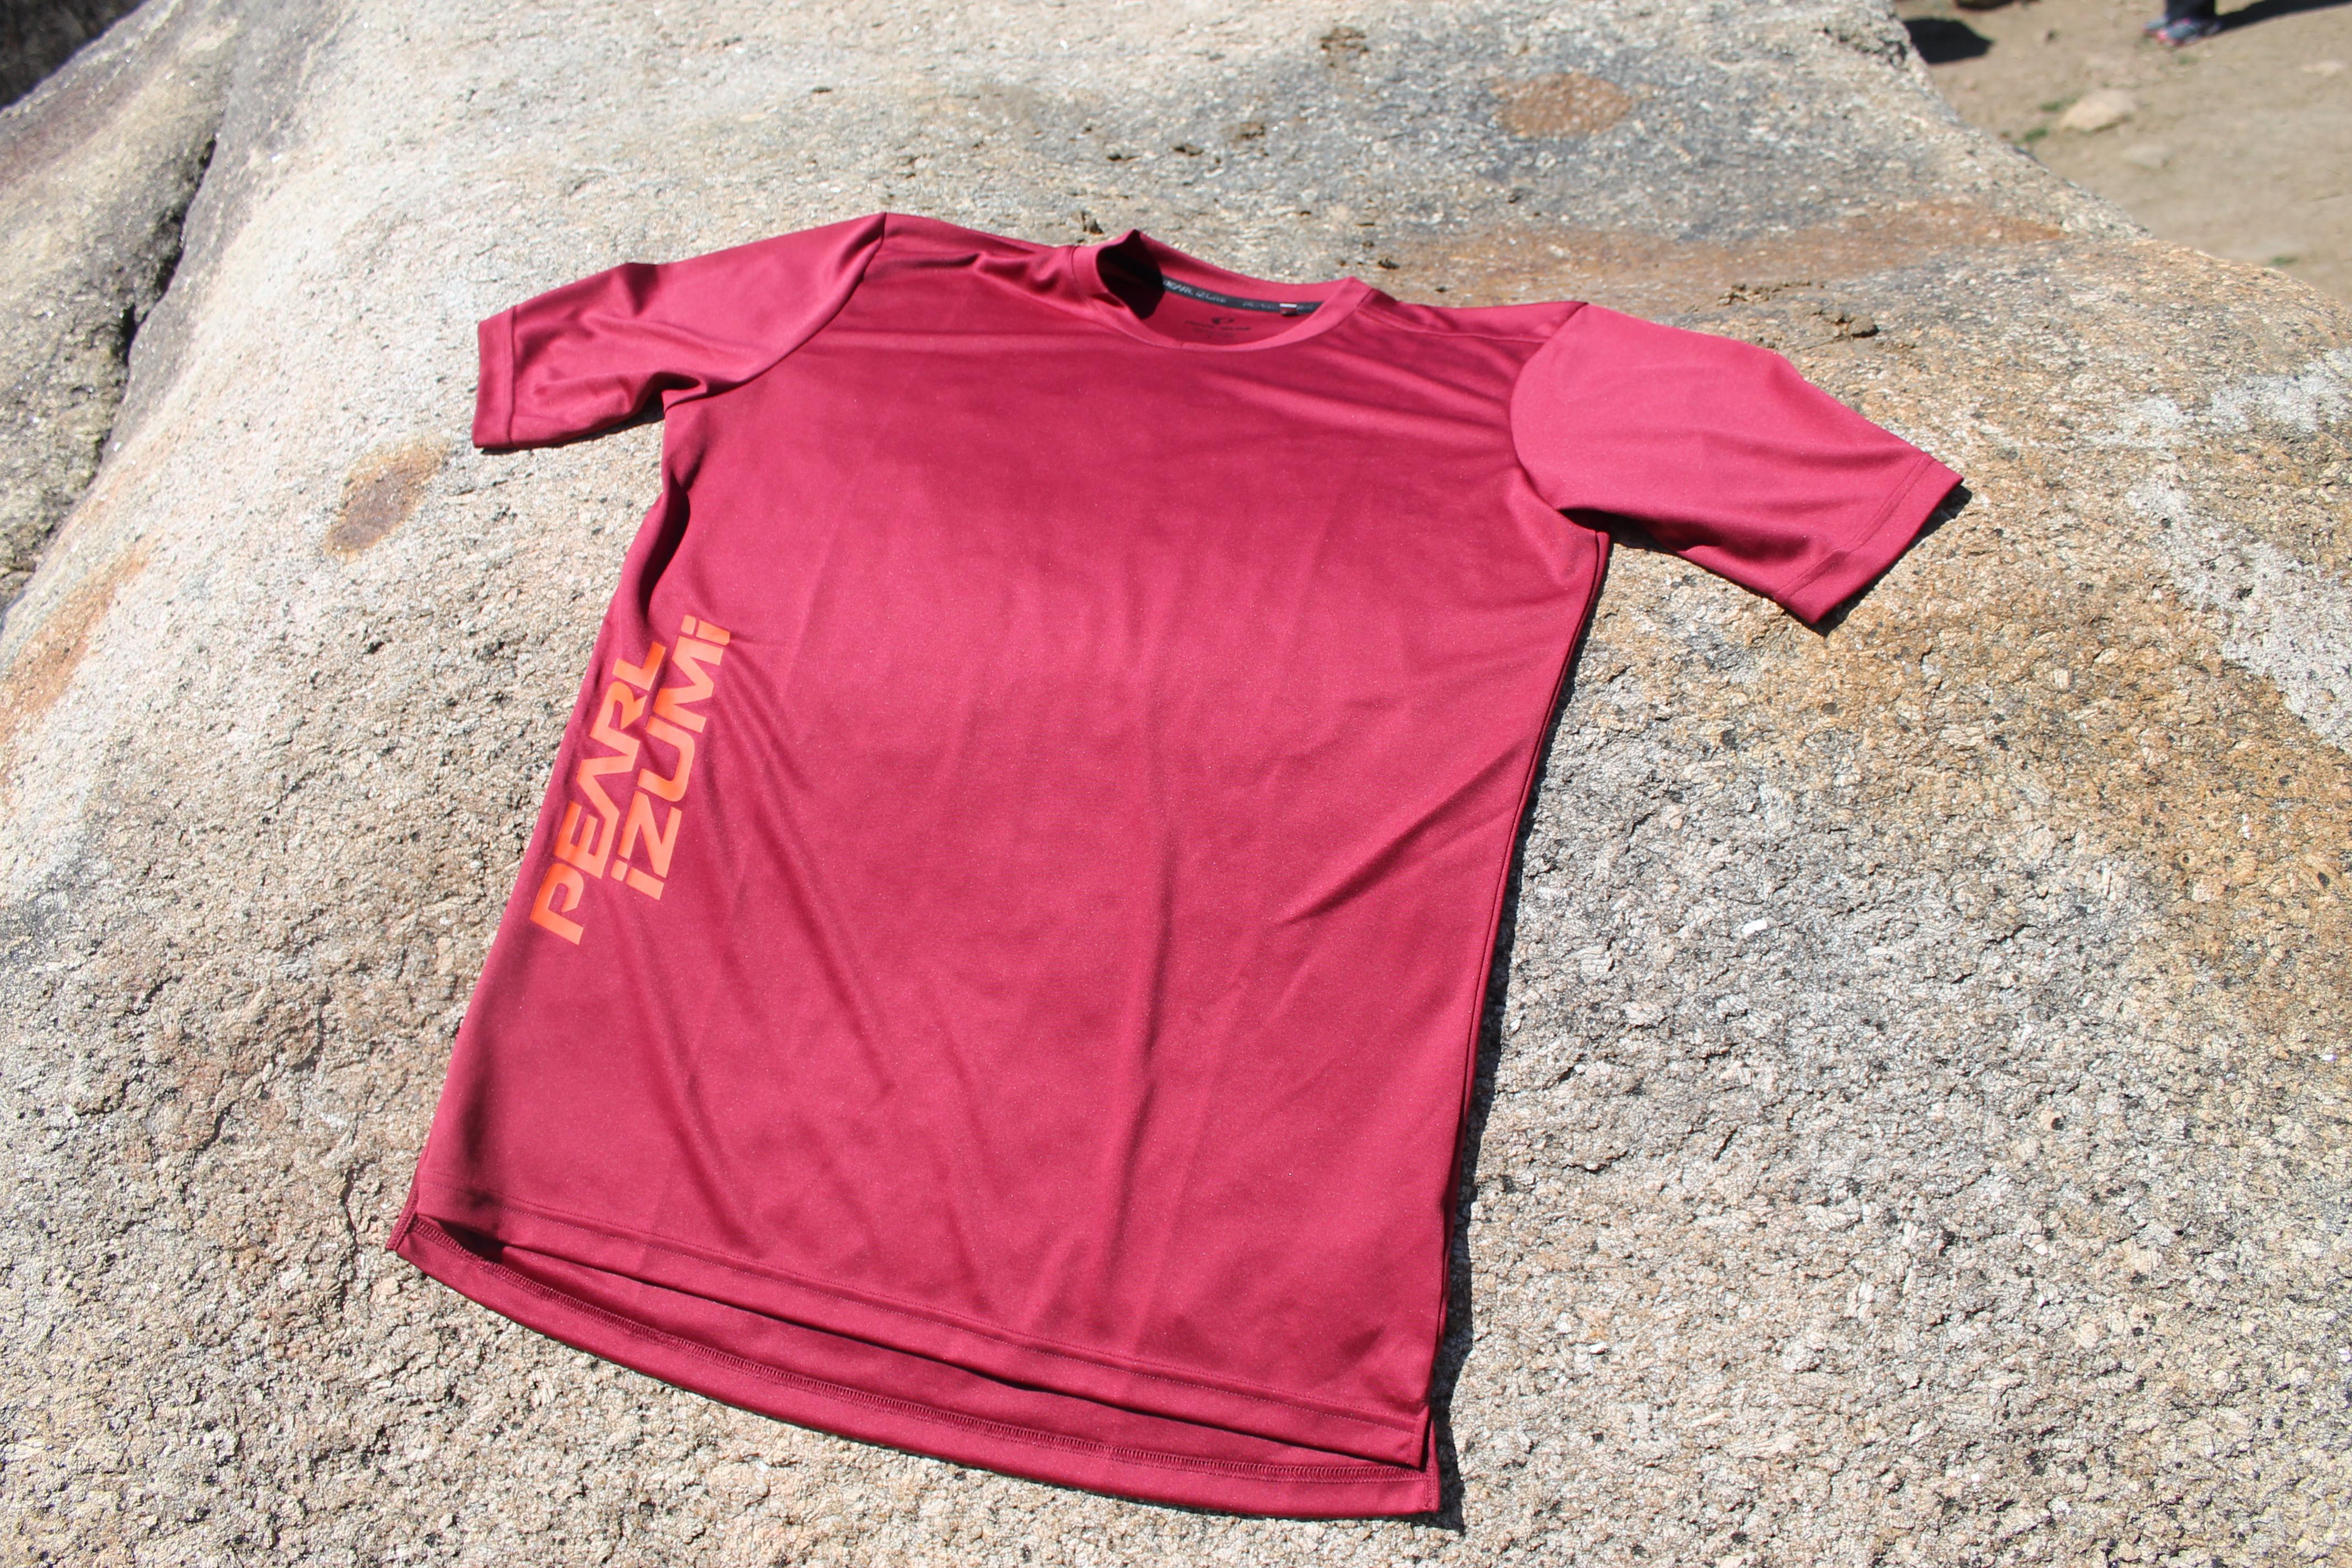 d0cad6354 Review  Pearl Izumi Elite Long Sleeve Jersey - Singletracks Mountain ...